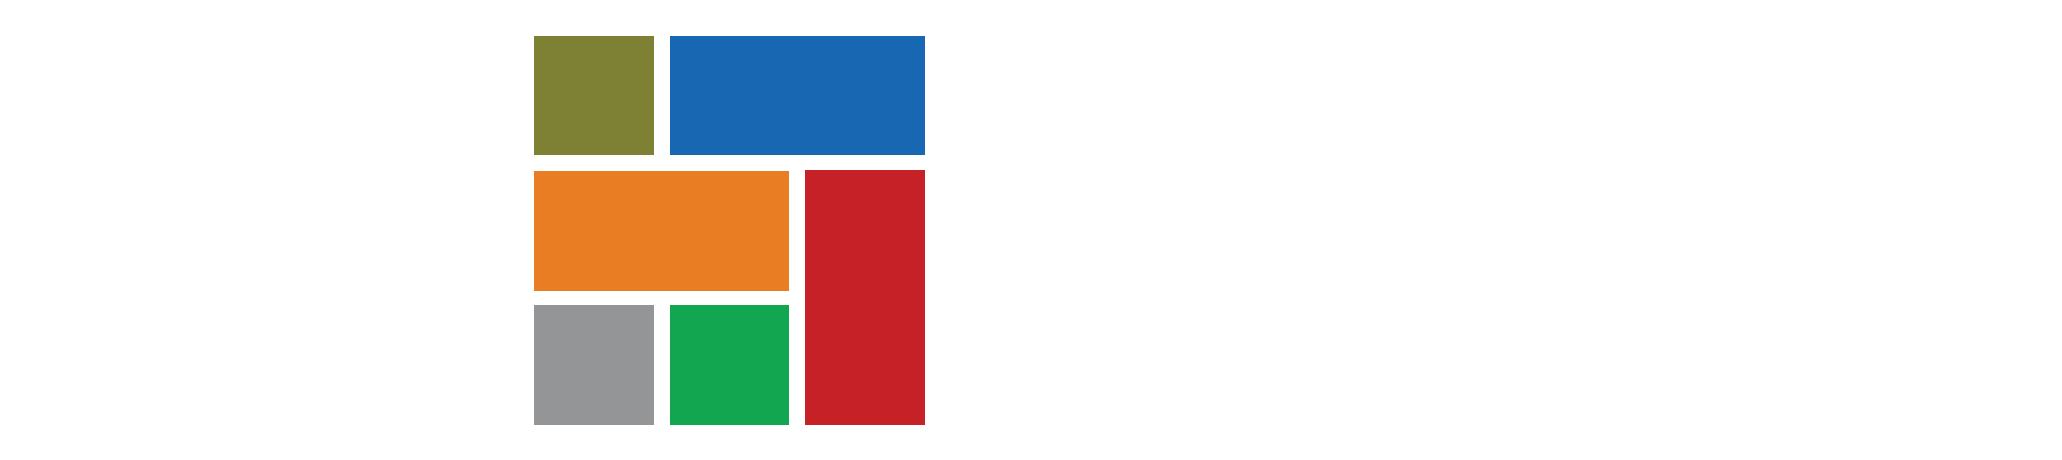 Convenience Retailing University